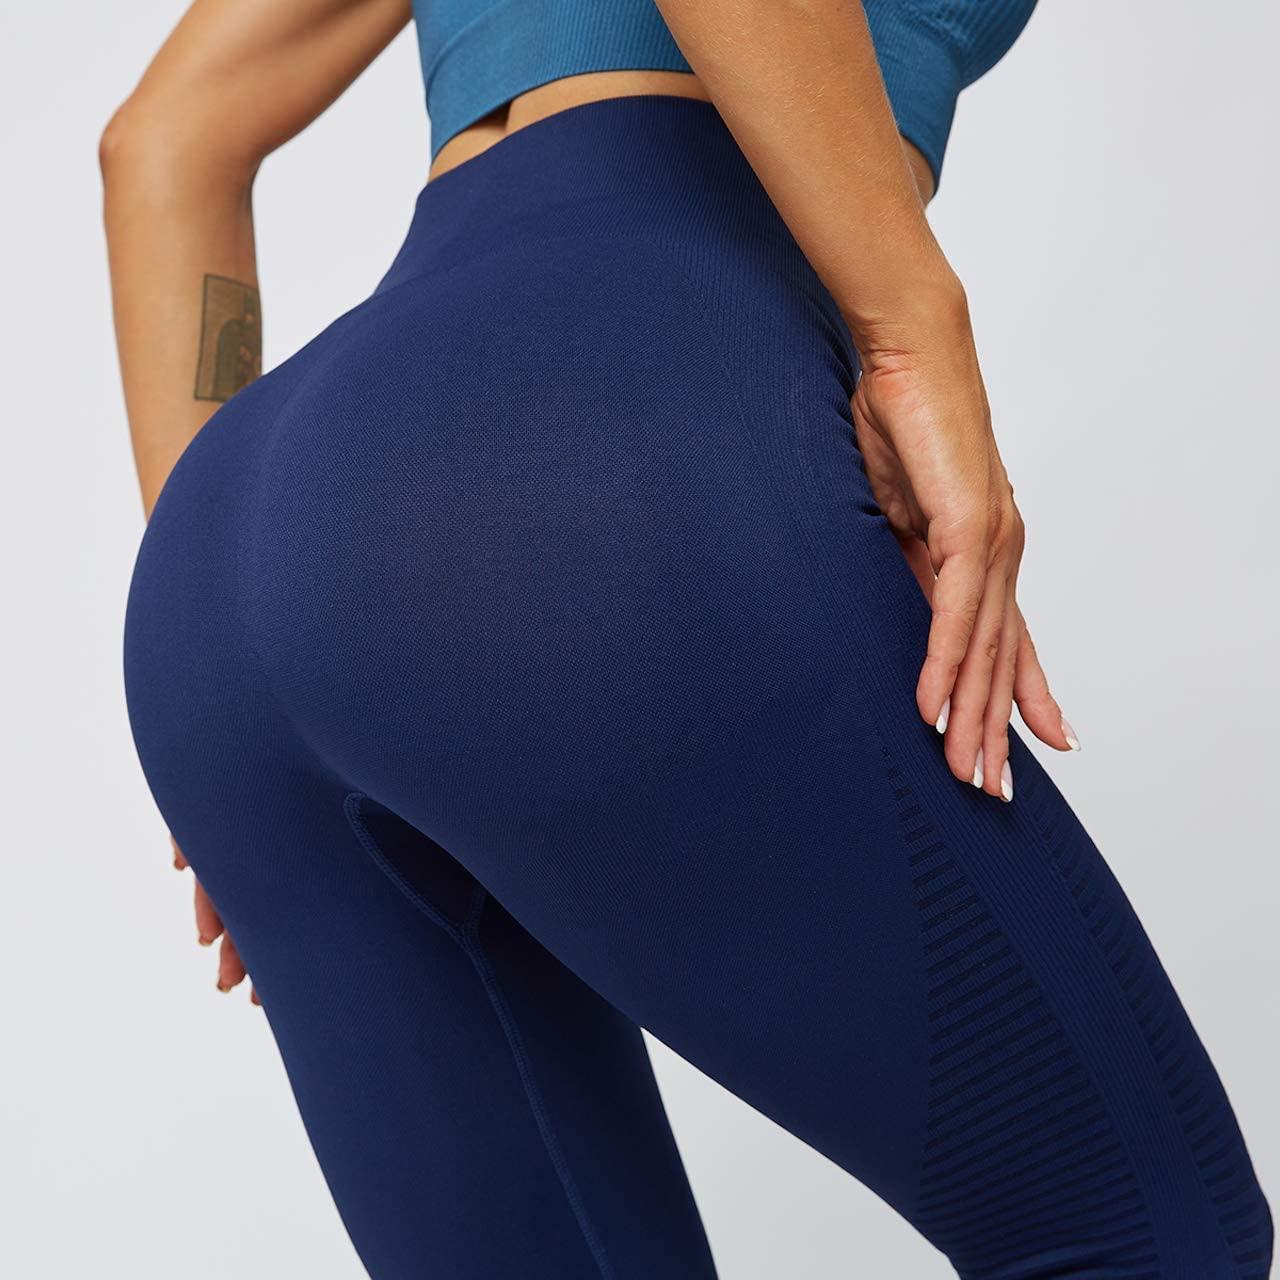 Touch of Love Yoga Pant Leggings